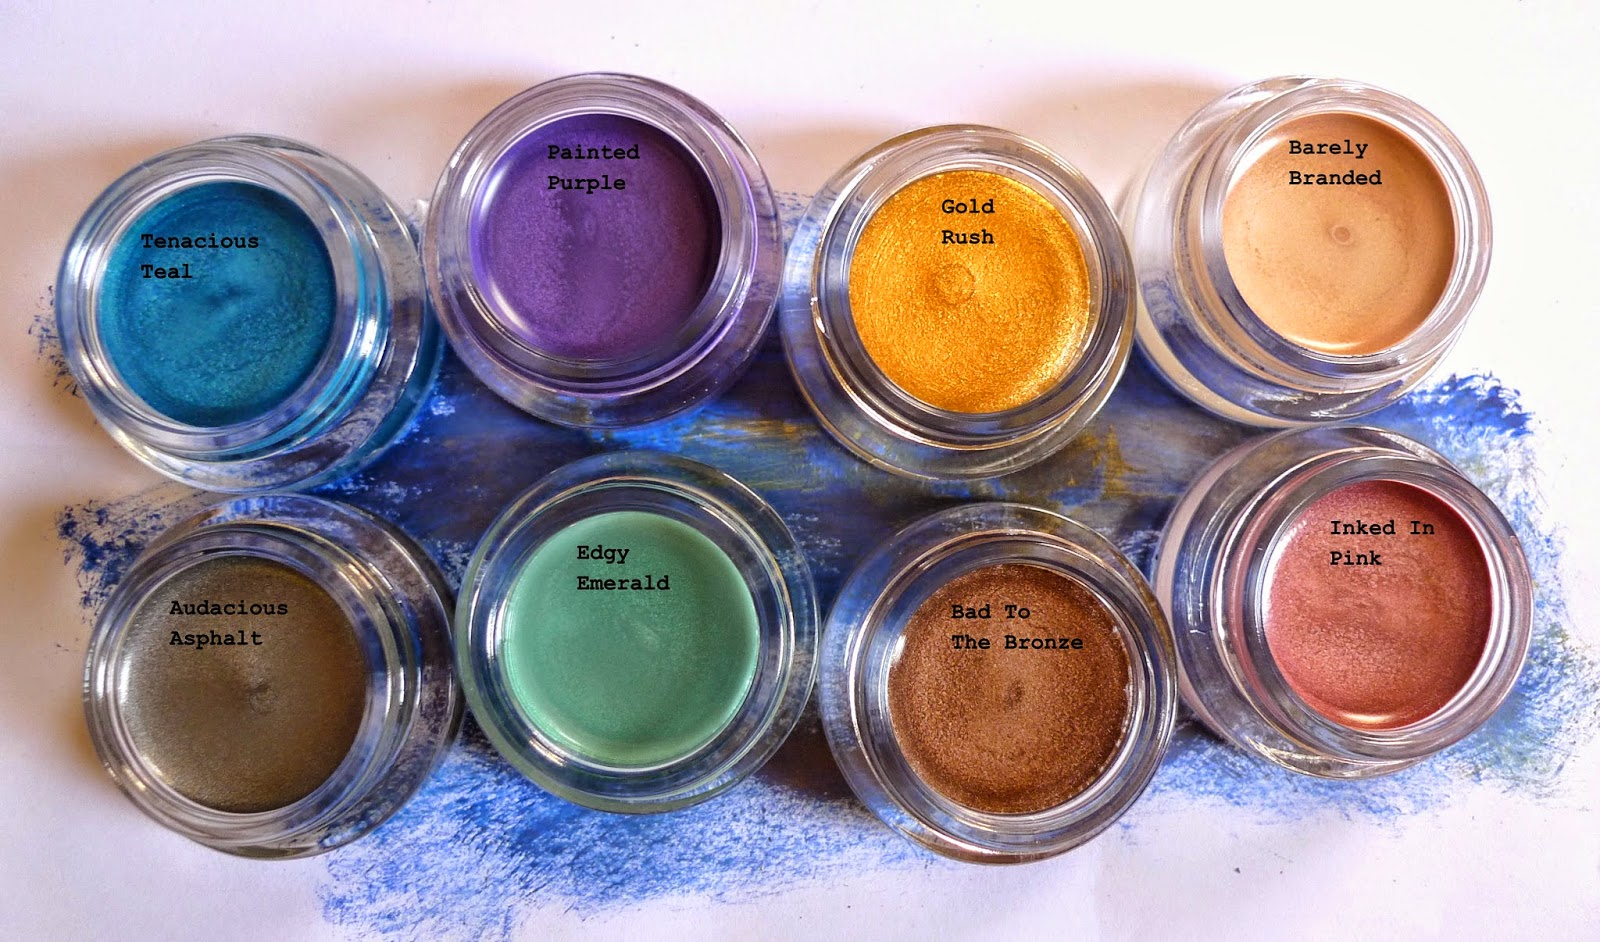 Maybelline eye studio color tattoo cream eyeshadow review for Maybelline color tattoo gel eyeshadow